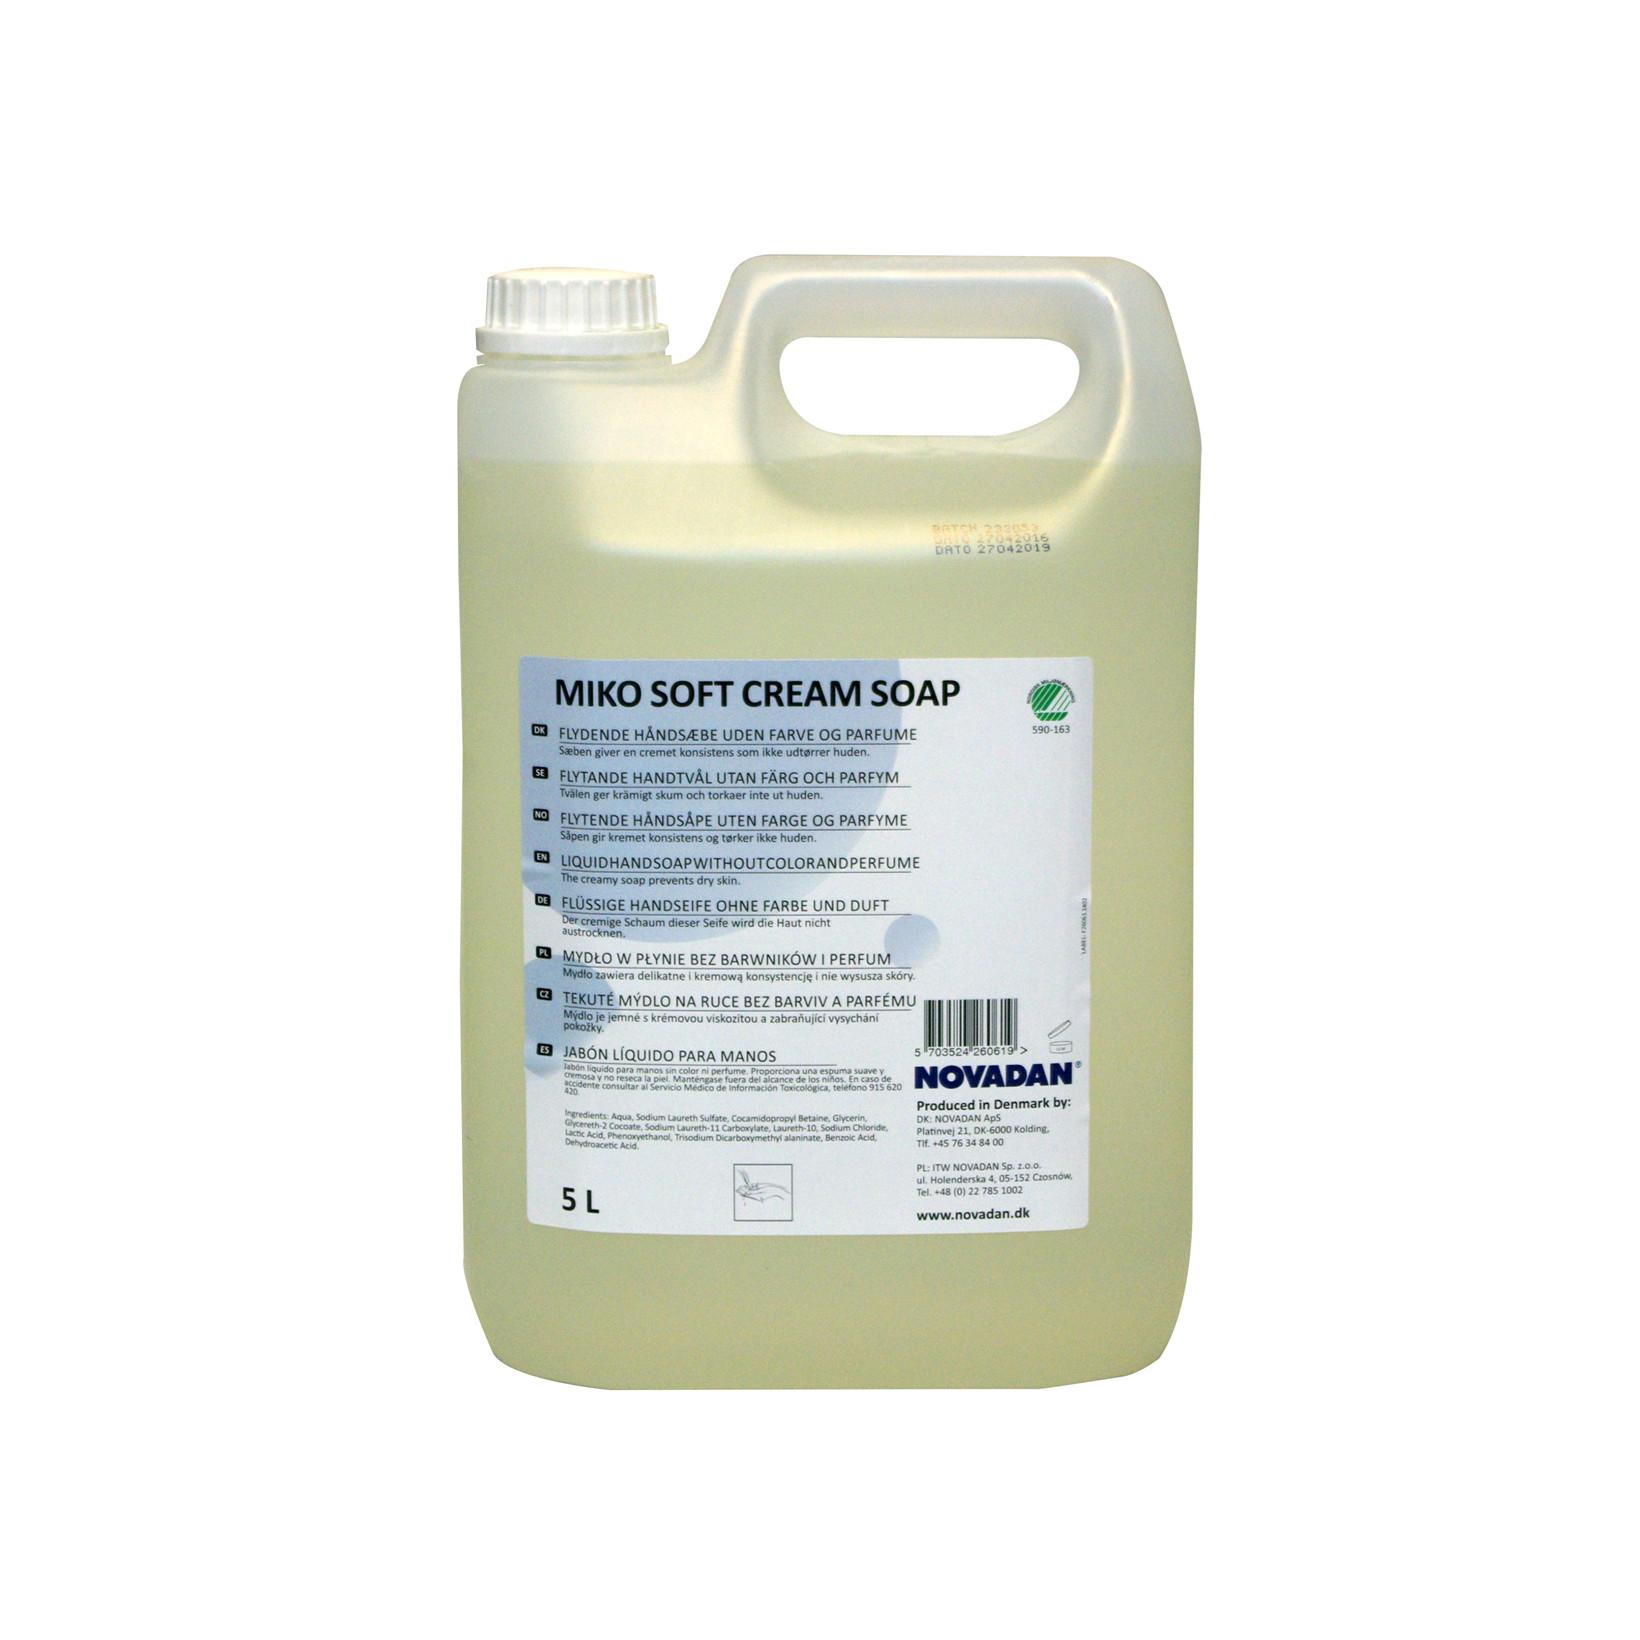 Novadan MIKO Soft Cream Soap Cremesæbe - 5 liter